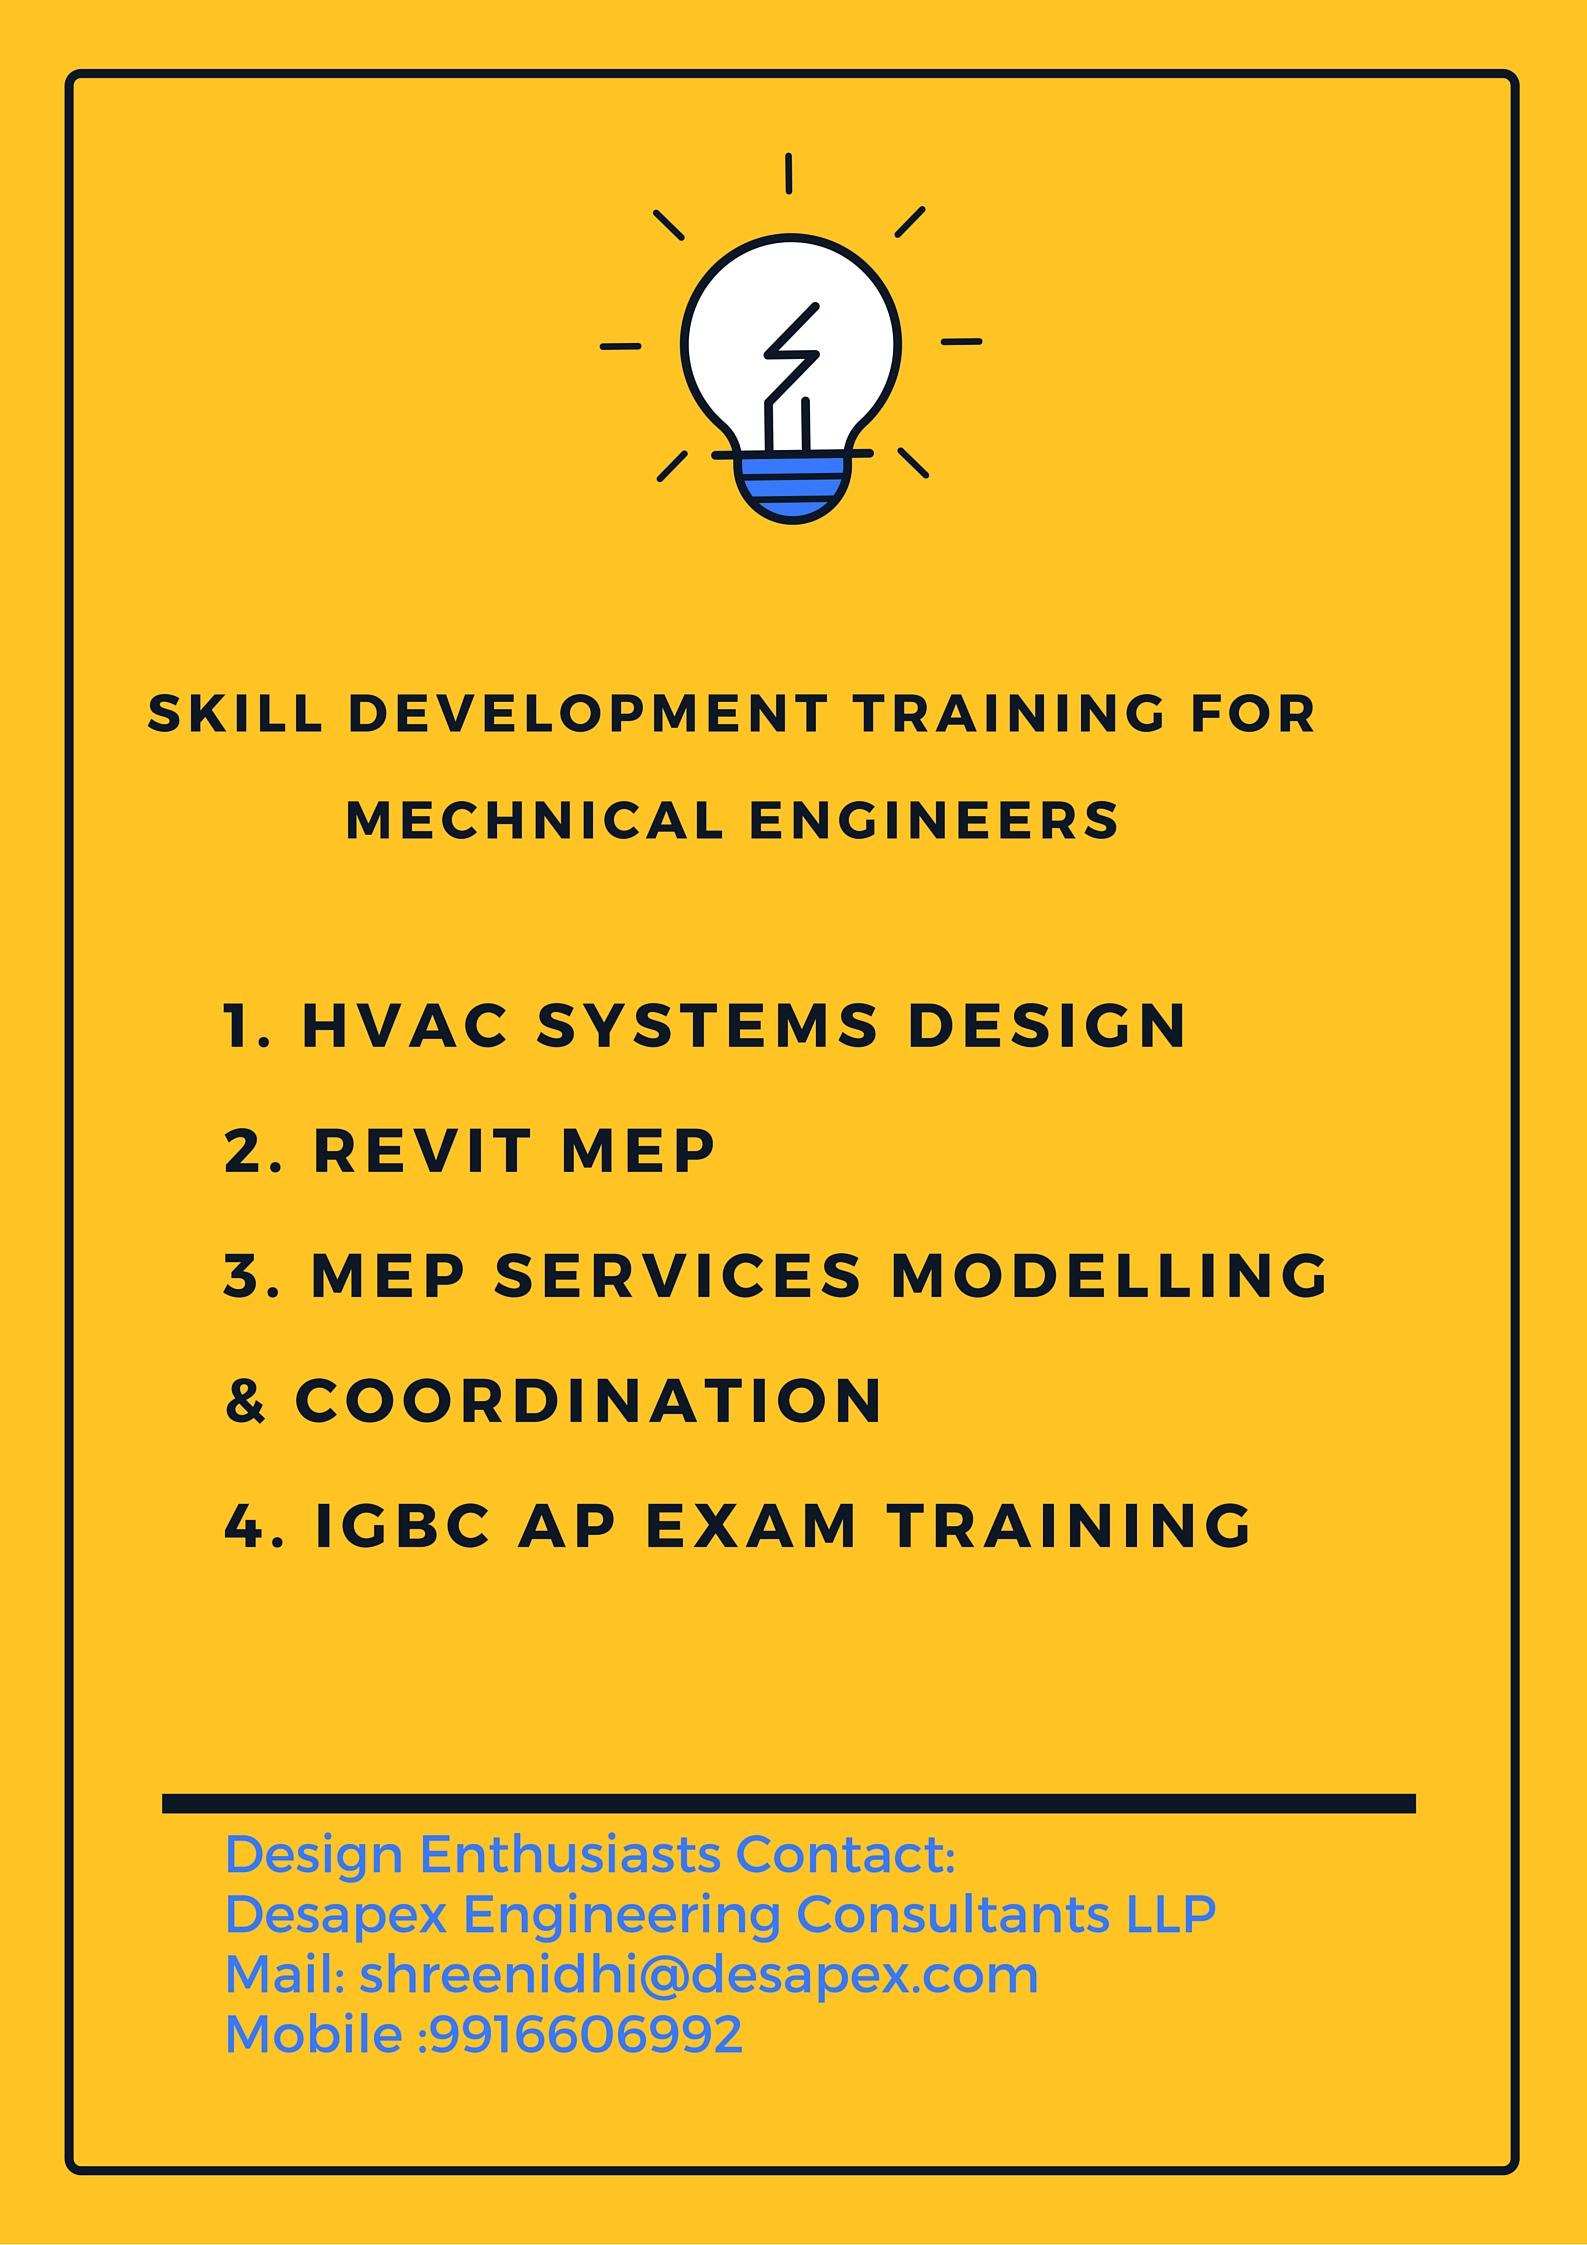 Desapex Engineering Consultants In Indira Nagar Bangalore 560008 Sulekha Bangalore